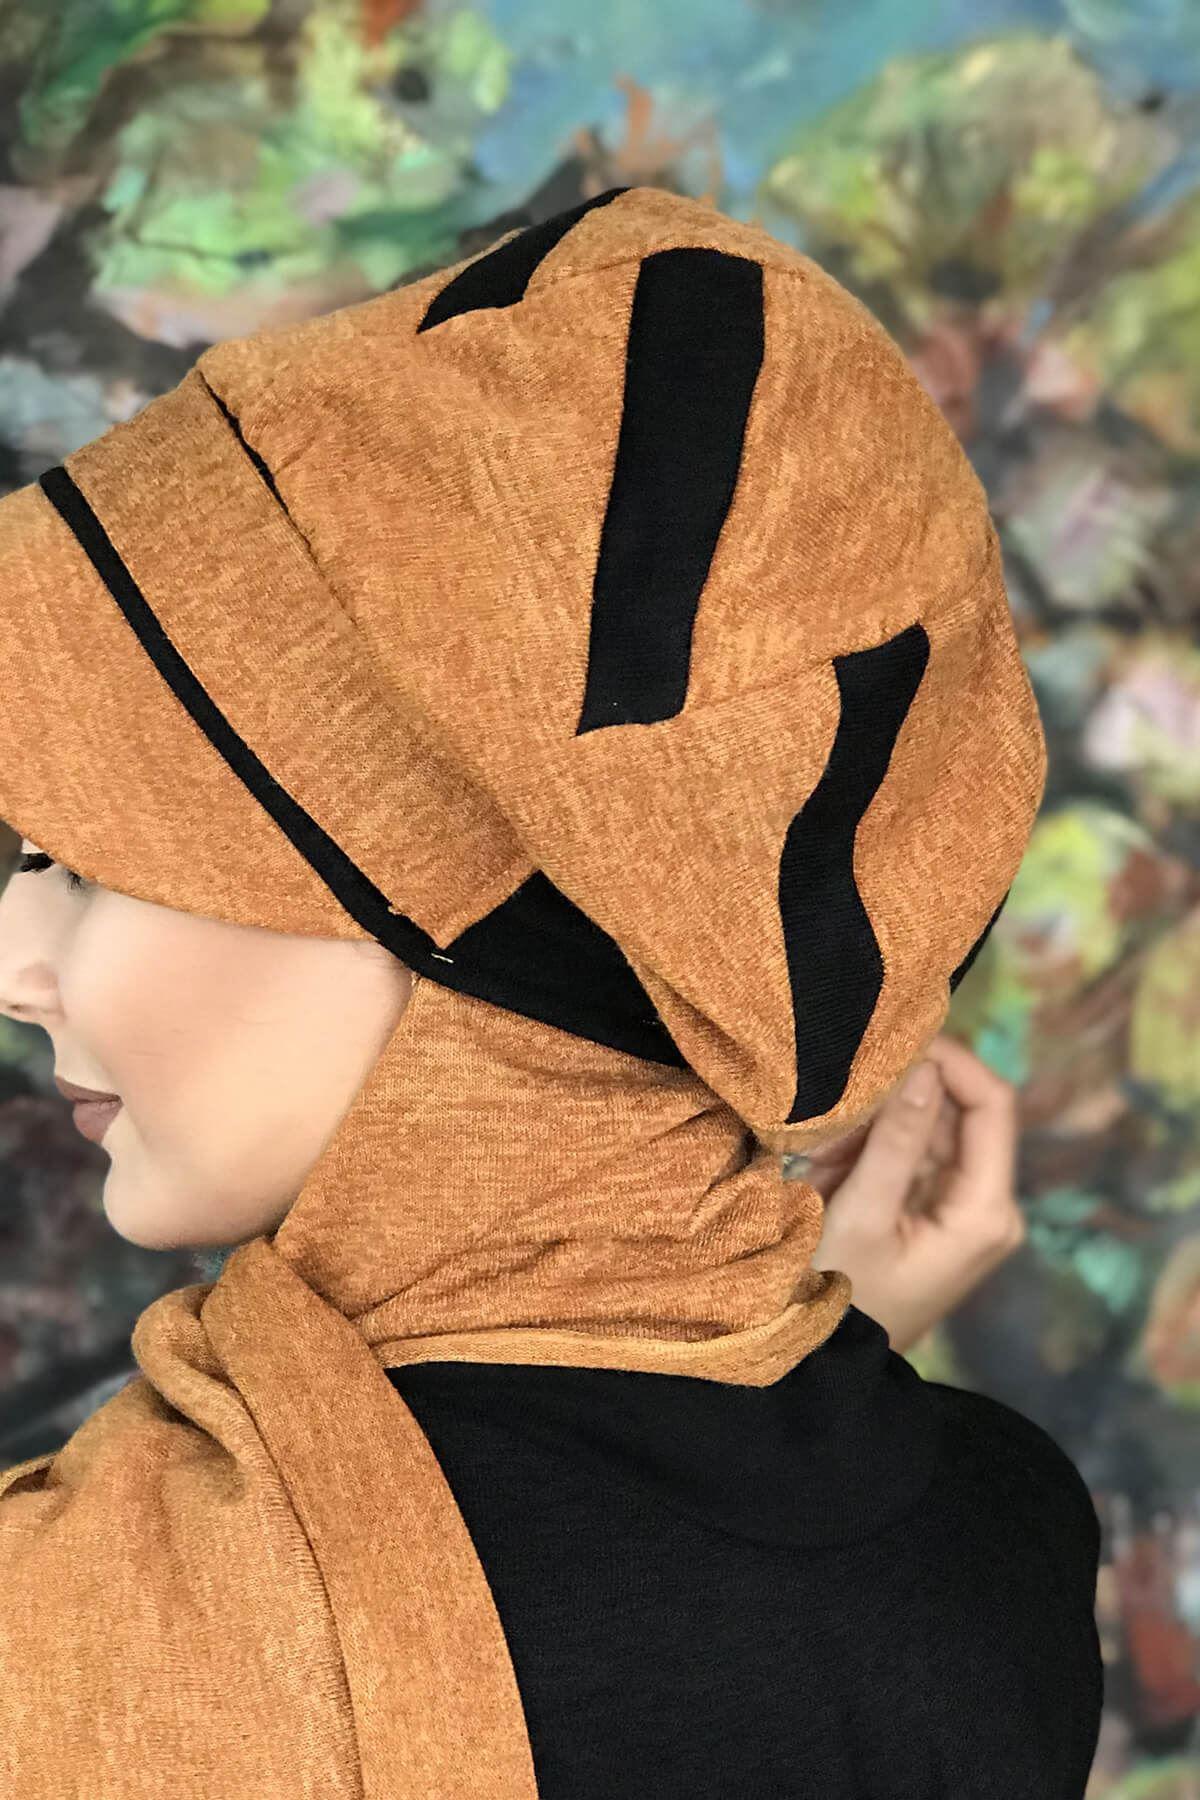 Ayçiçeği Renkli Siyah Şerit Detaylı Atkılı Şapka Şal